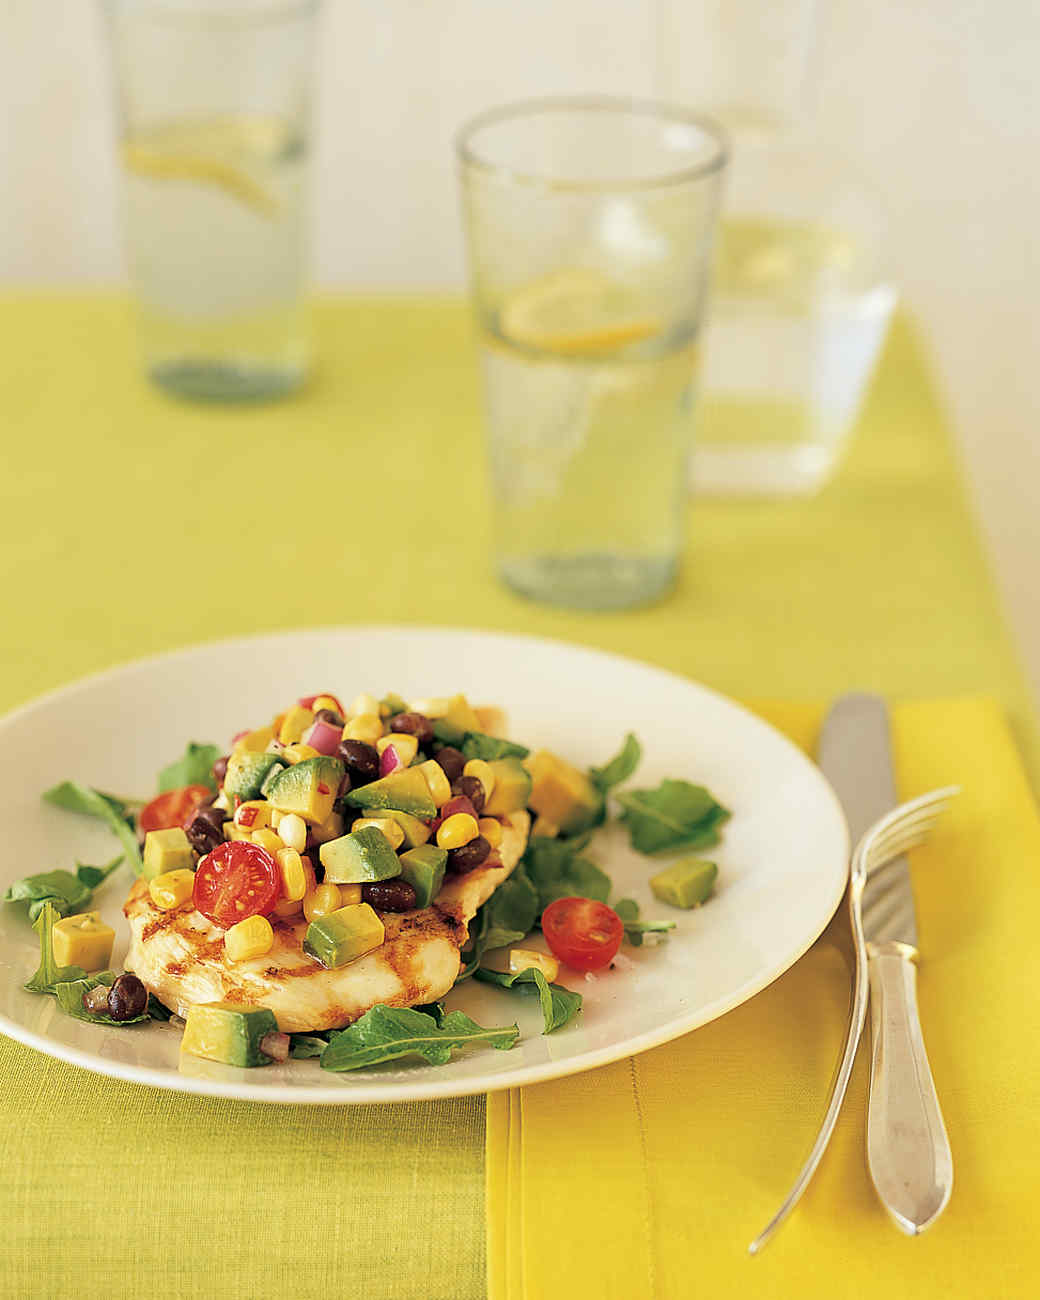 Lemon Chicken with Avocado-Corn Salsa